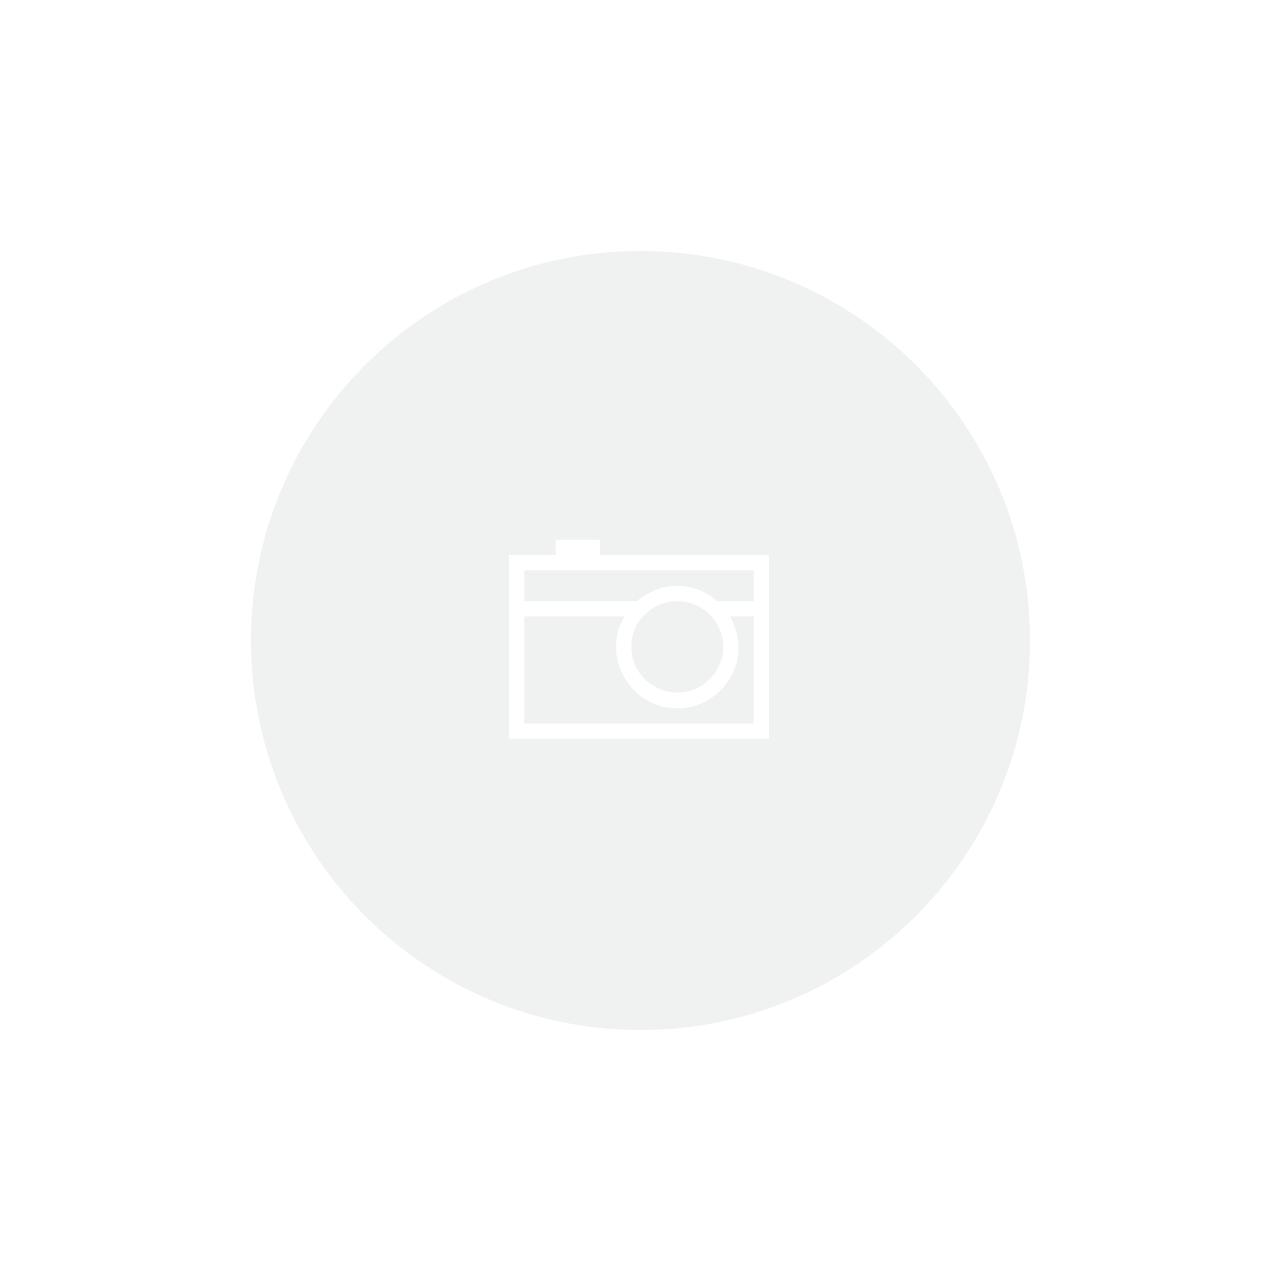 COROA 32D ICTUS NARROW WIDE ASSIMÉTRICA BCD 96mm (12V)